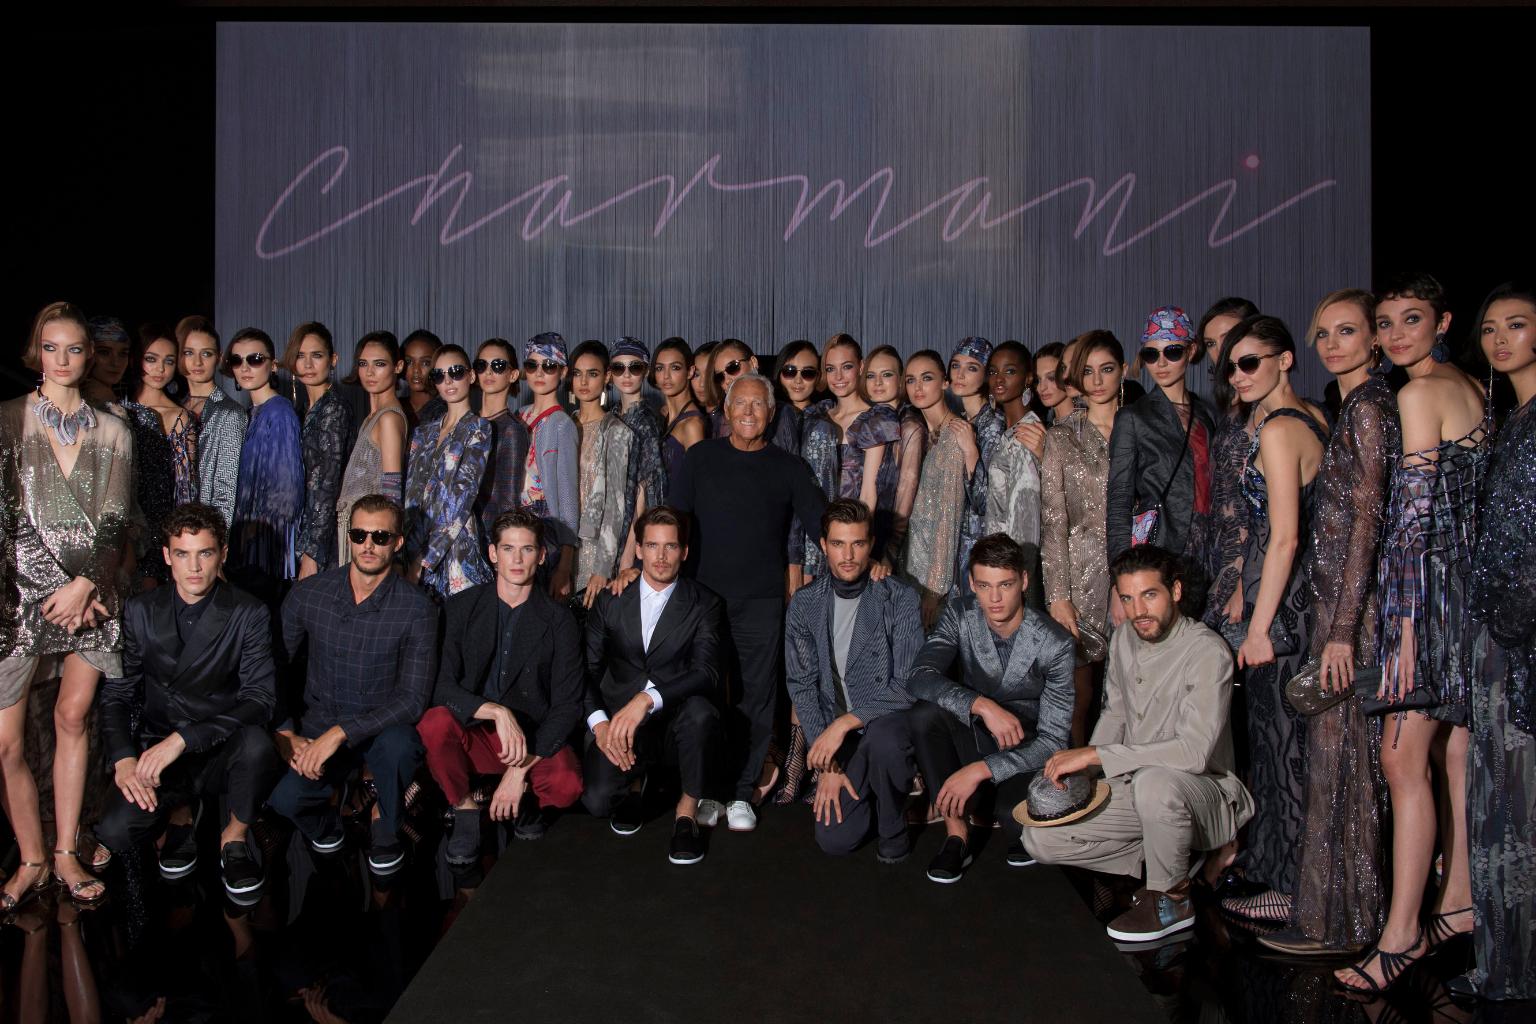 giorgio-armani-womenswear-ss17_ga-with-models